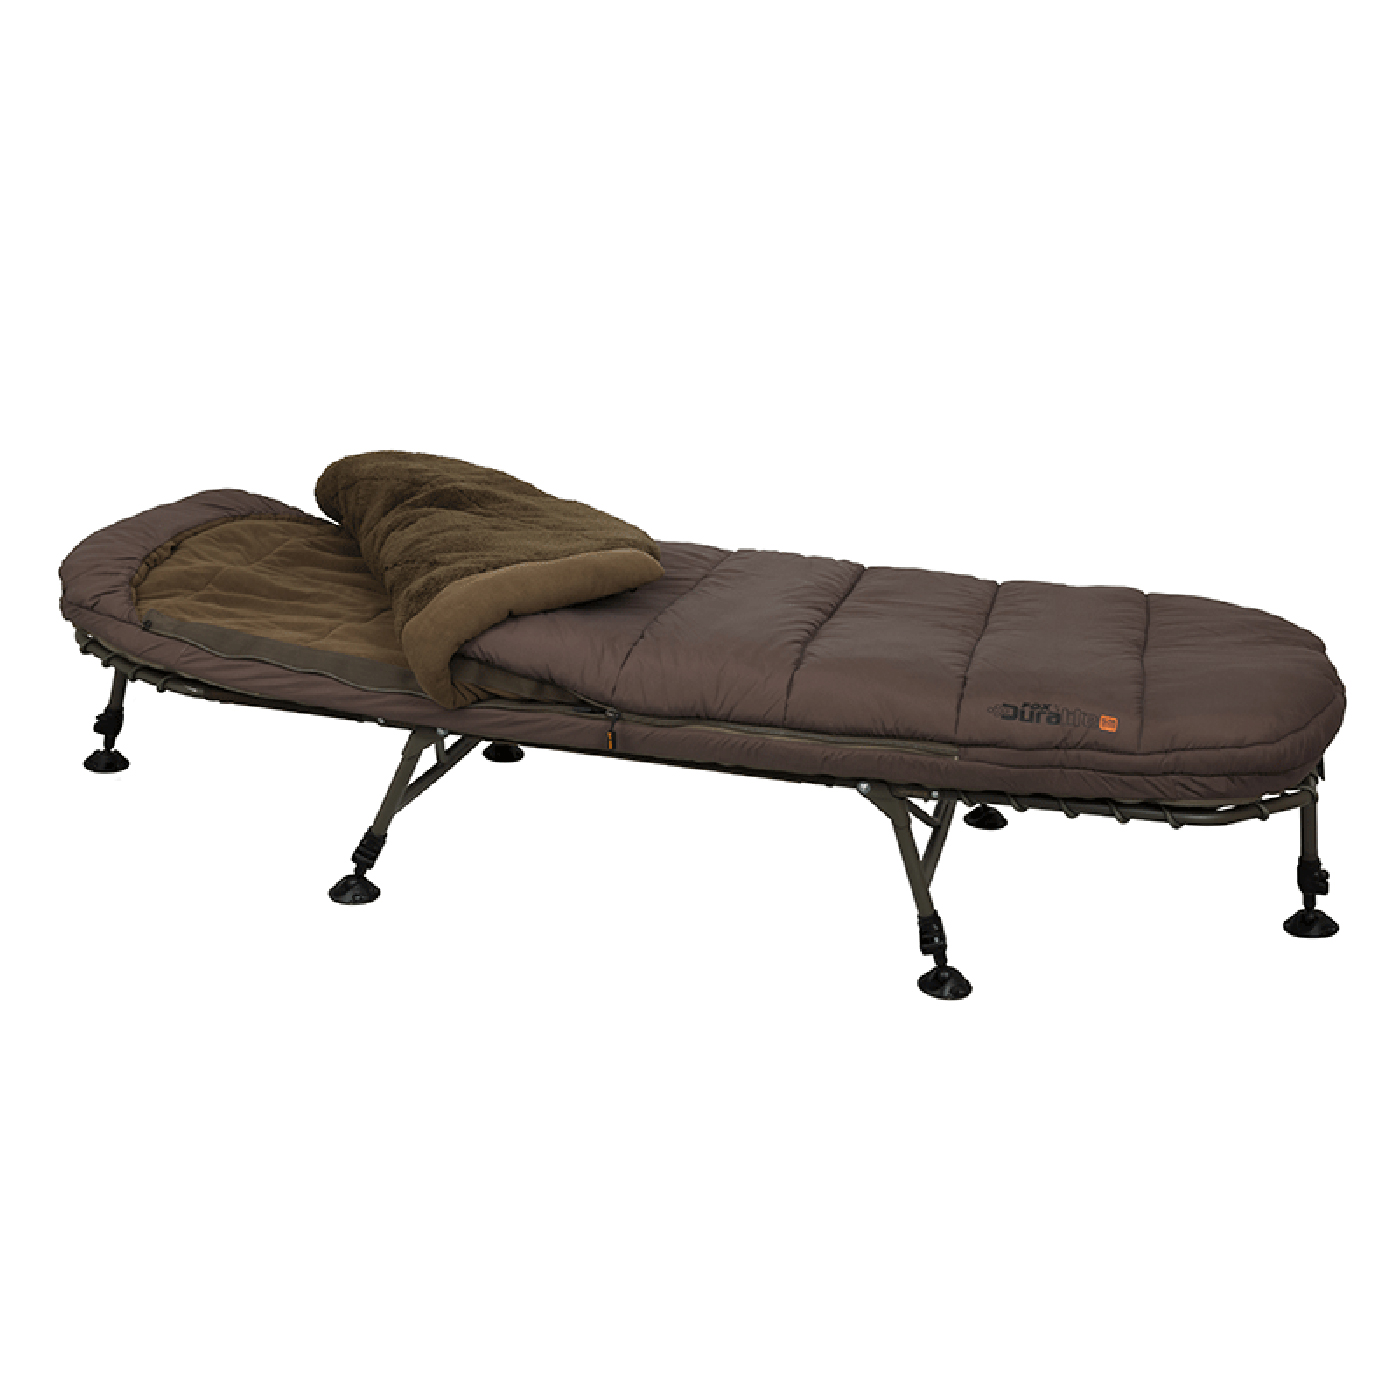 Fox Duralite 3 Season System Bedchair